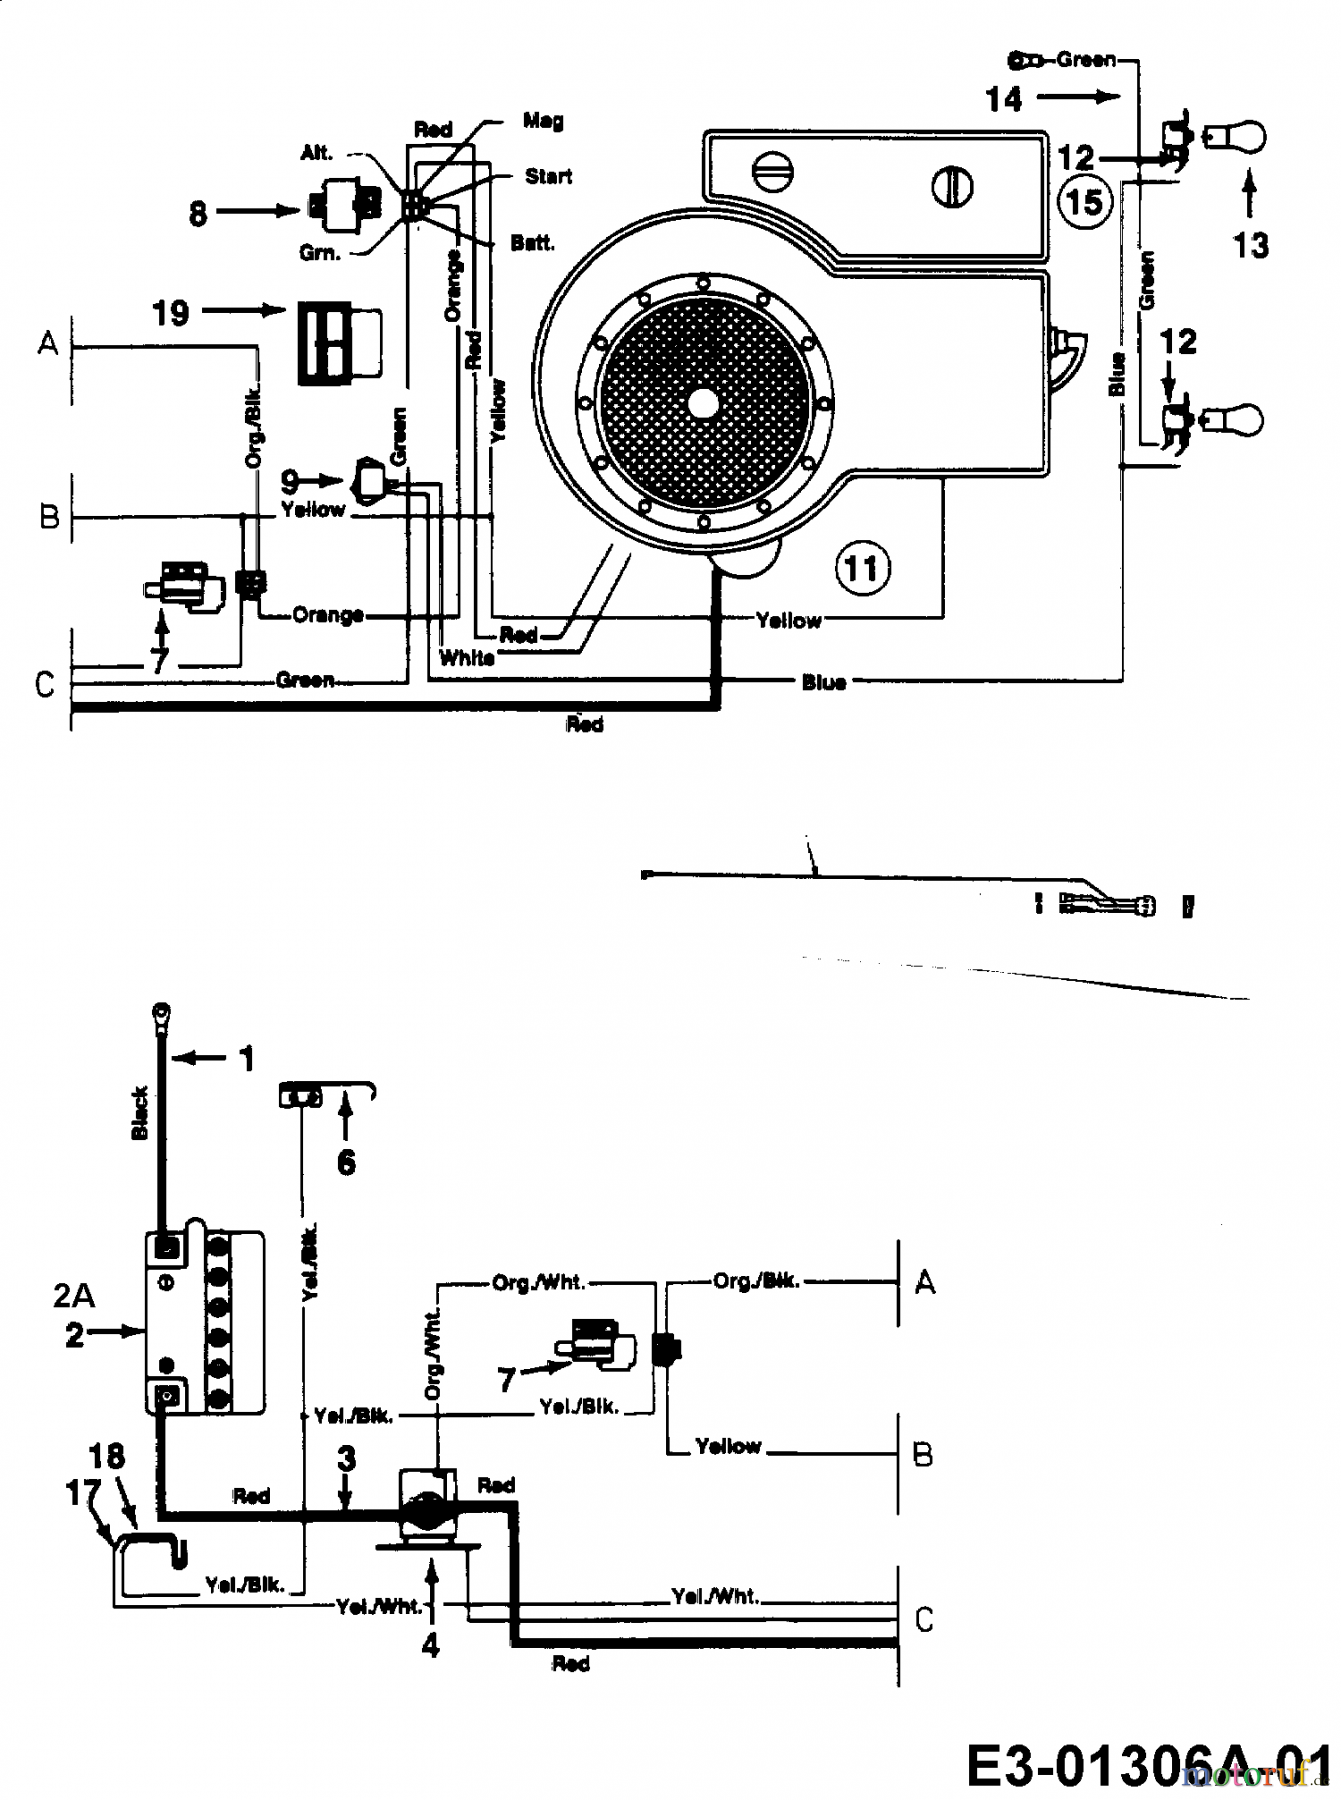 schema electrique tracteur tondeuse mtd